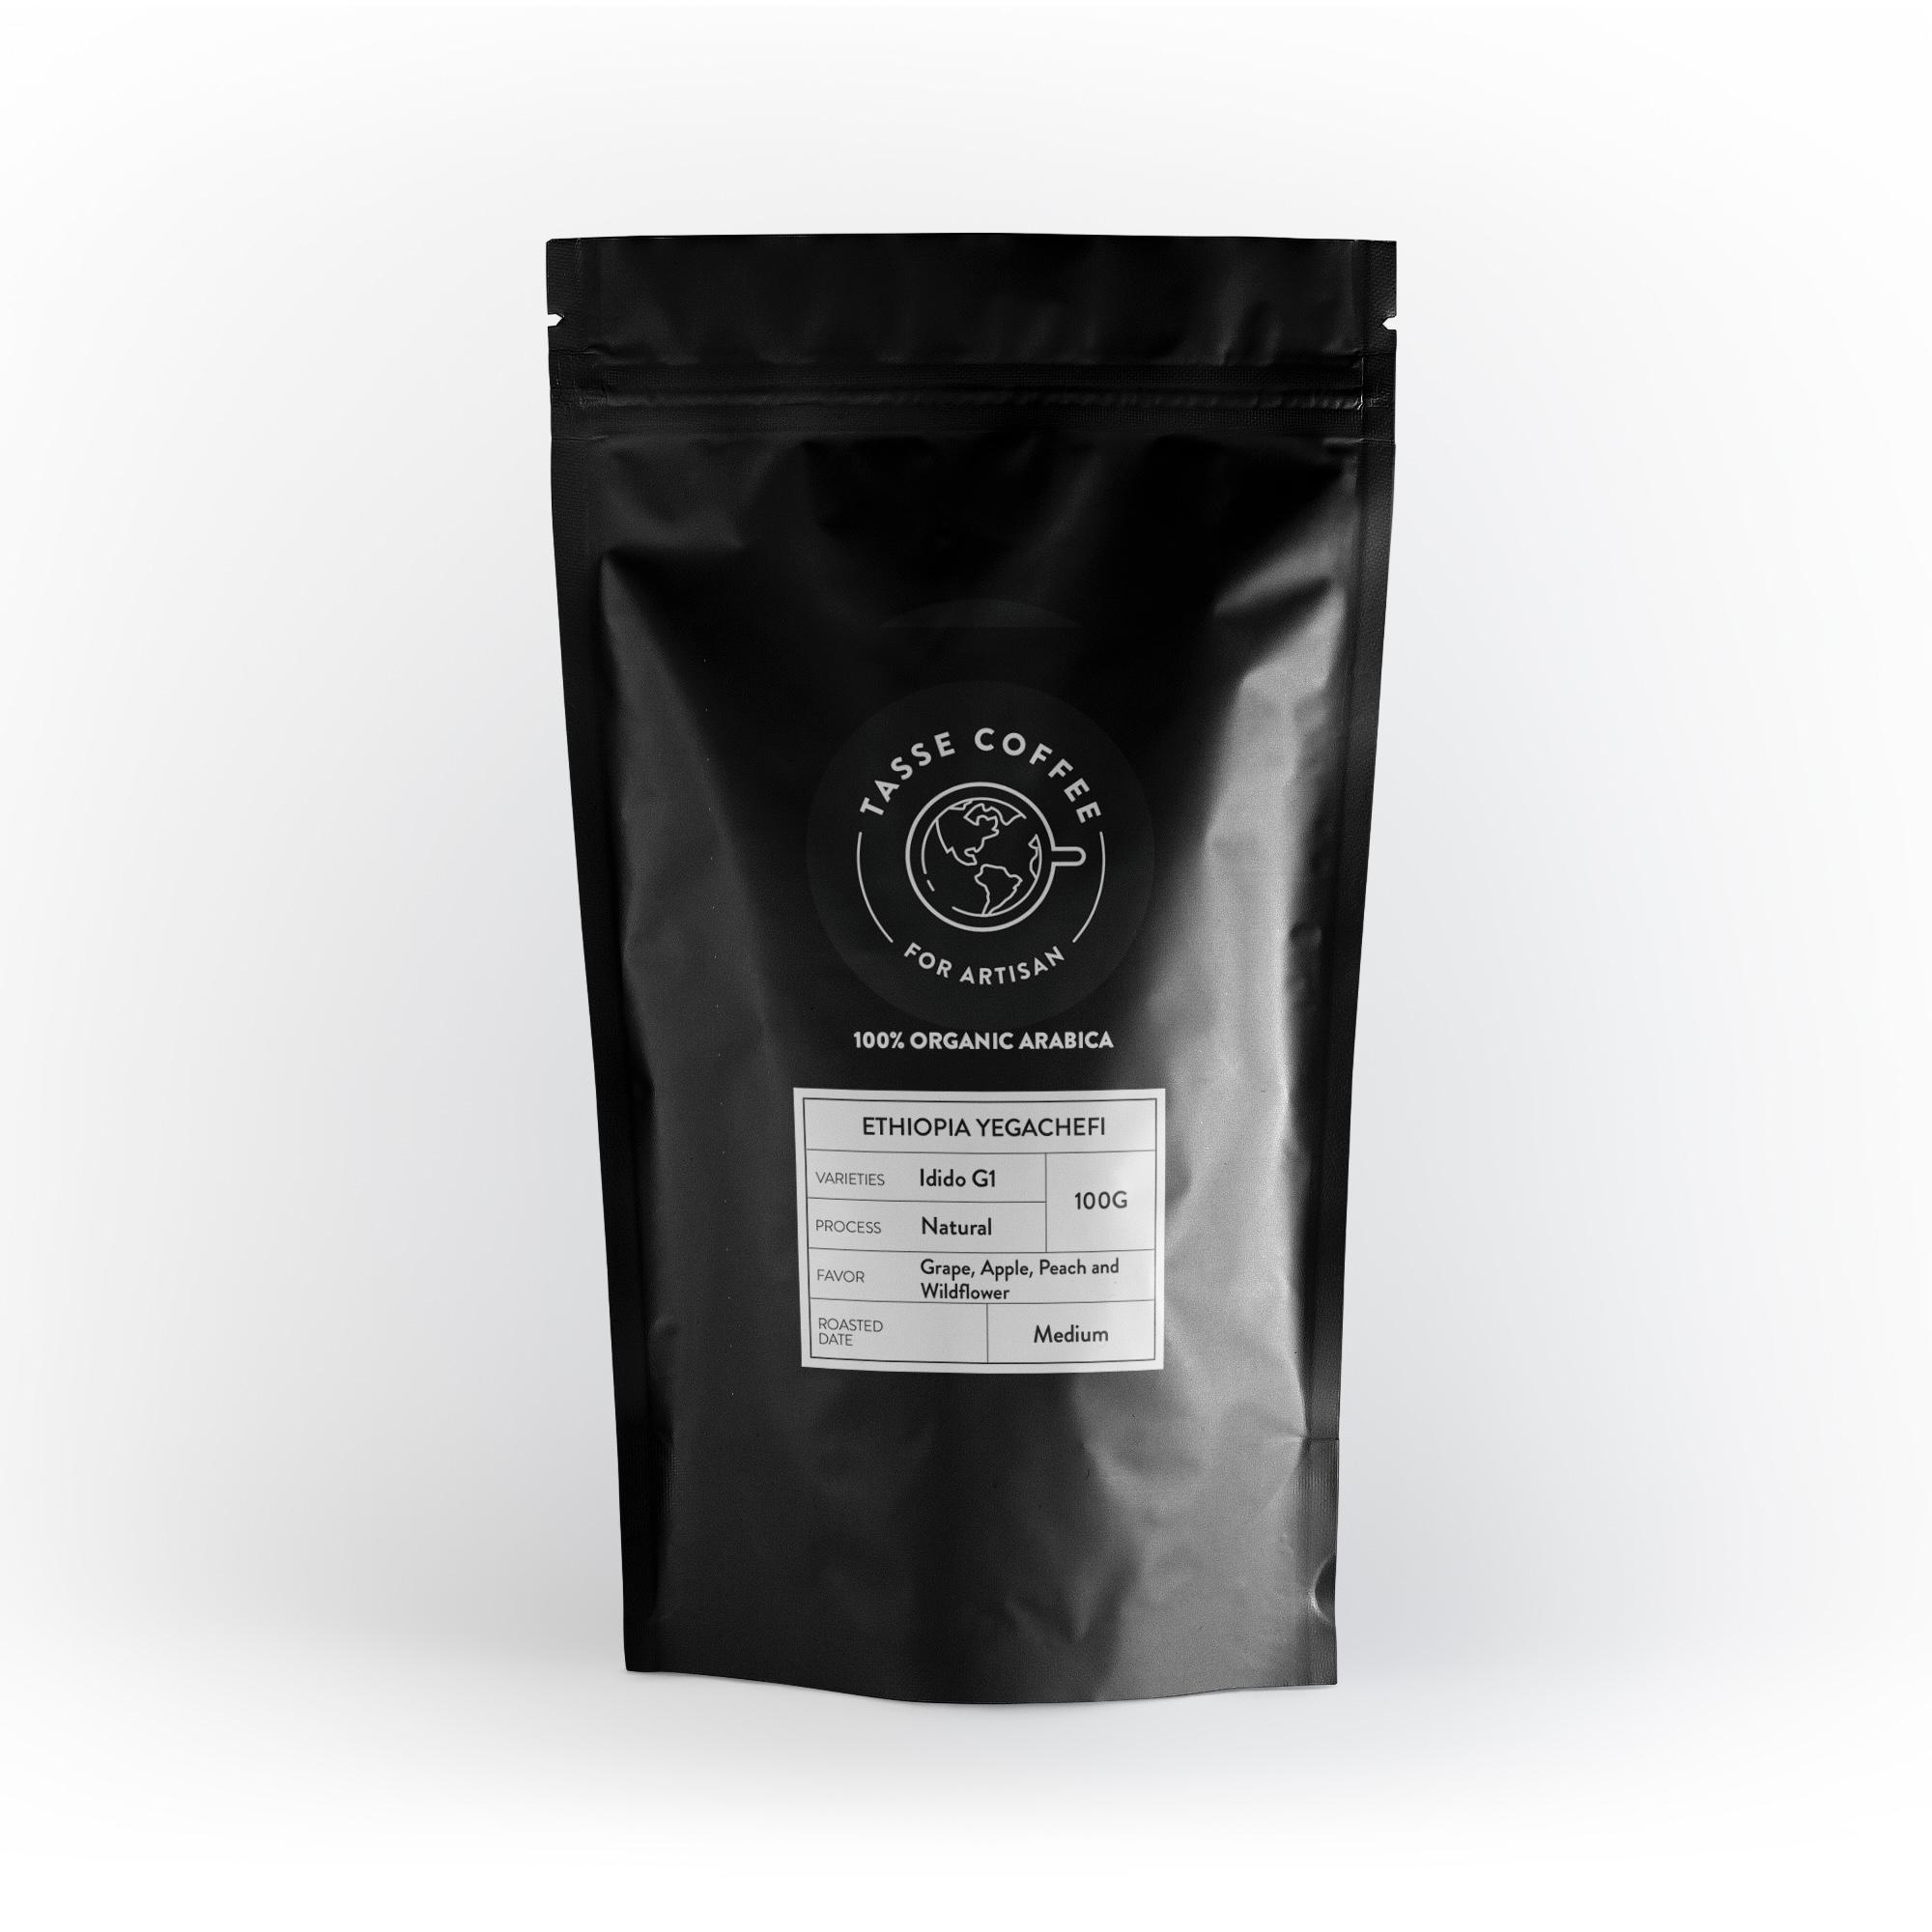 Tasse Coffee - Taiwan Roasted Specialty Coffee - Ethiopia Yirgacheffe